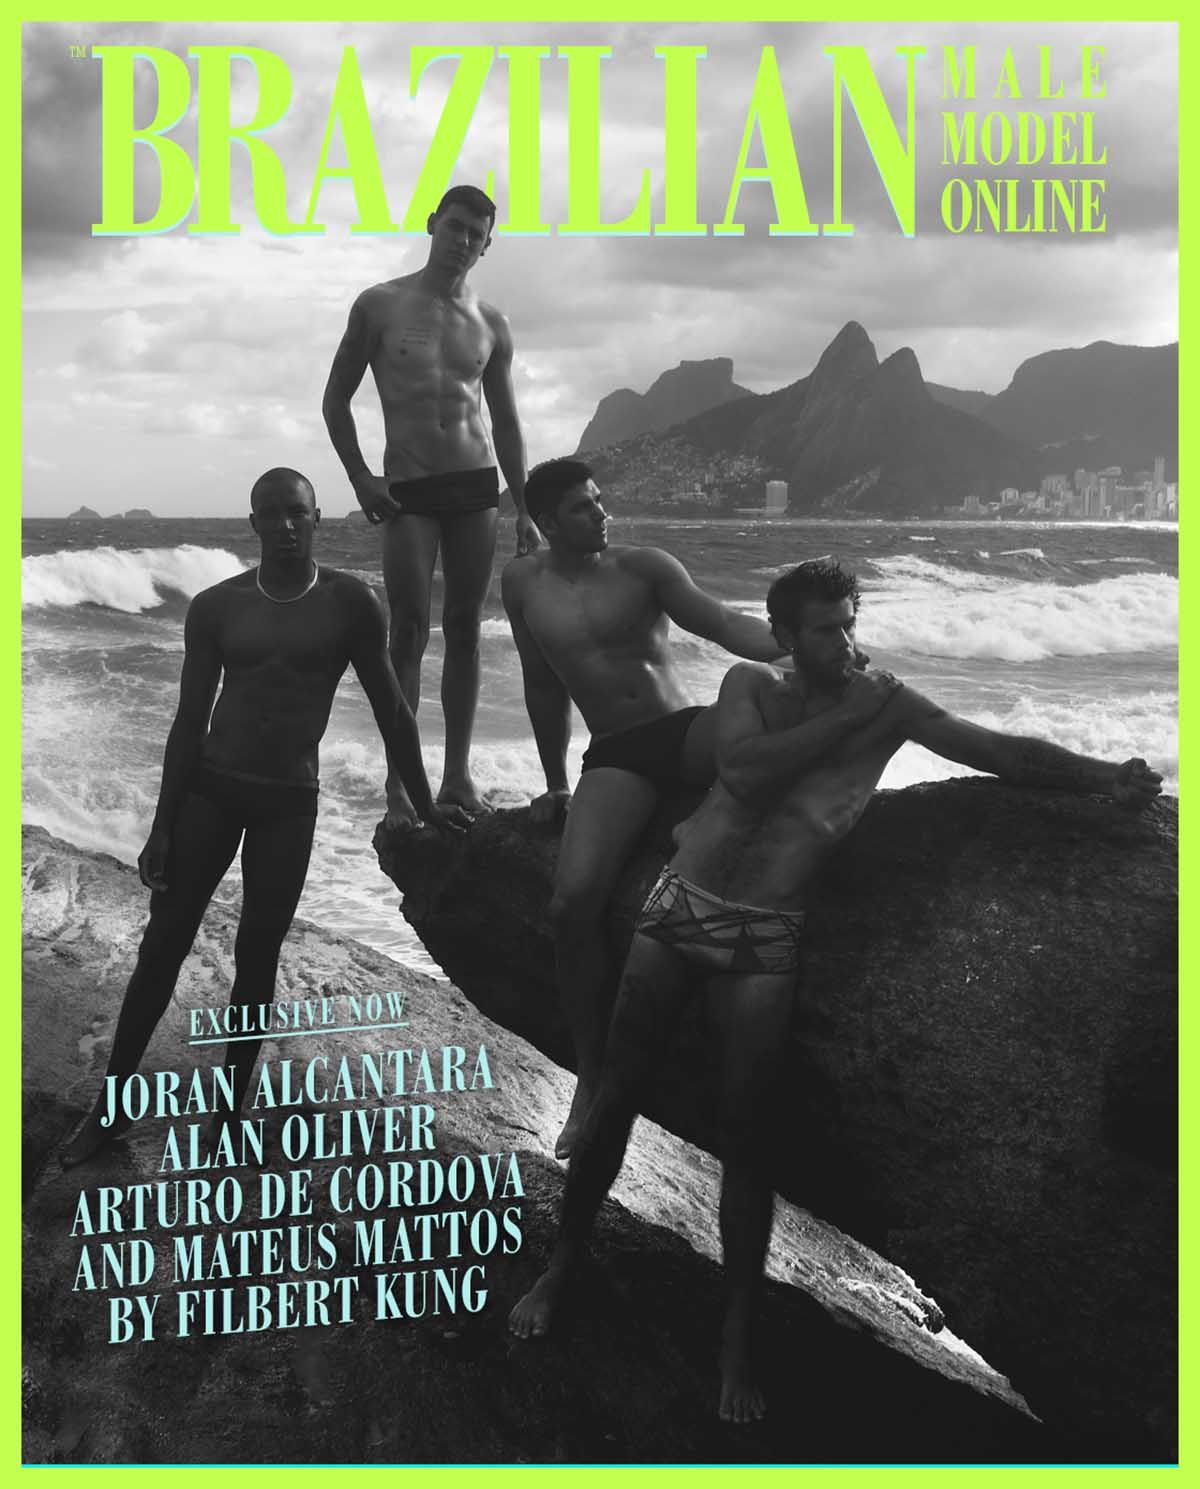 Joran Alcantara, Alan Oliver, Arturo de Cordova and Mateus Mattos by Filbert Kung